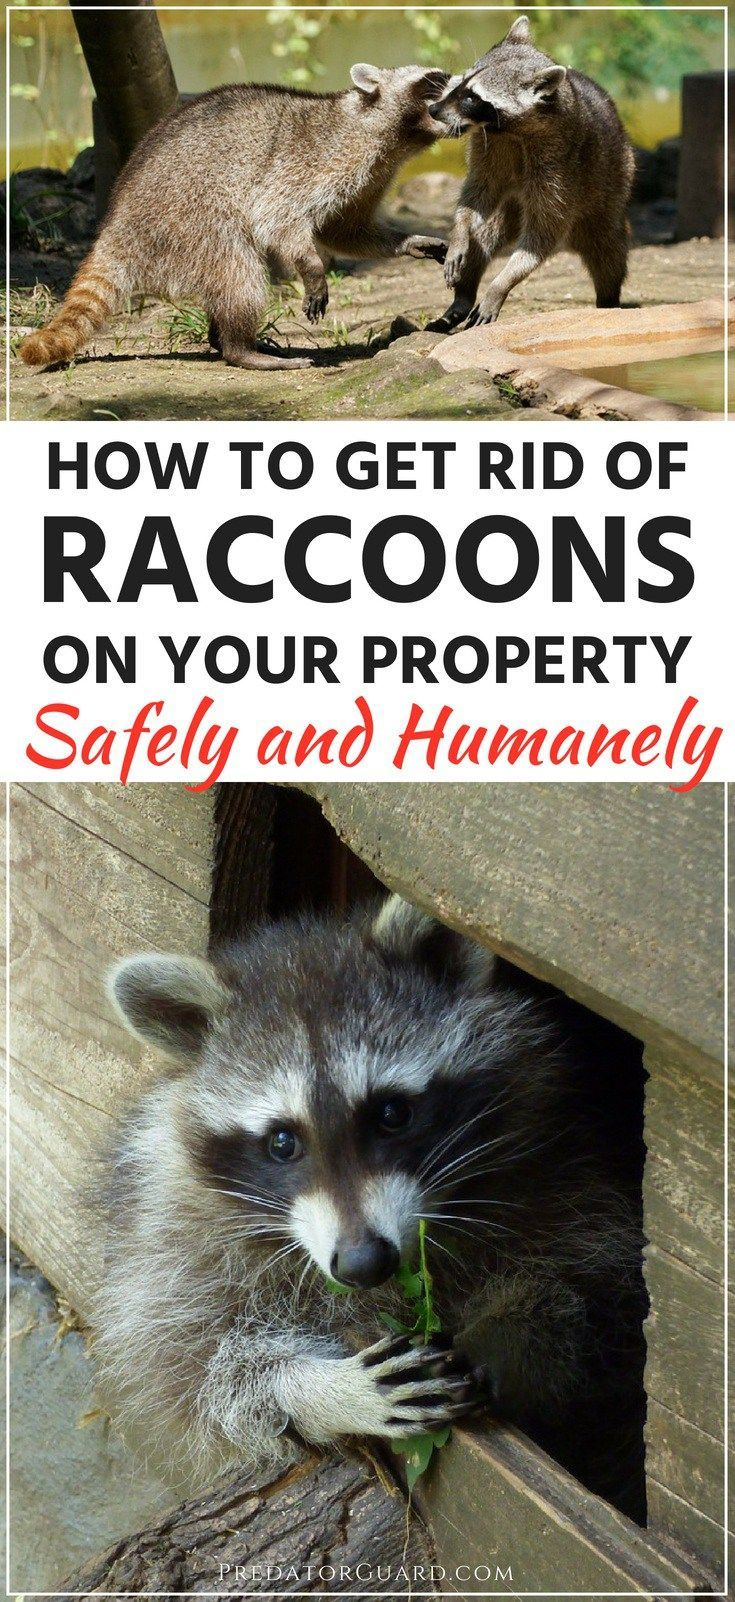 How To Get Rid Of Raccoons Getting Rid Of Raccoons Raccoon